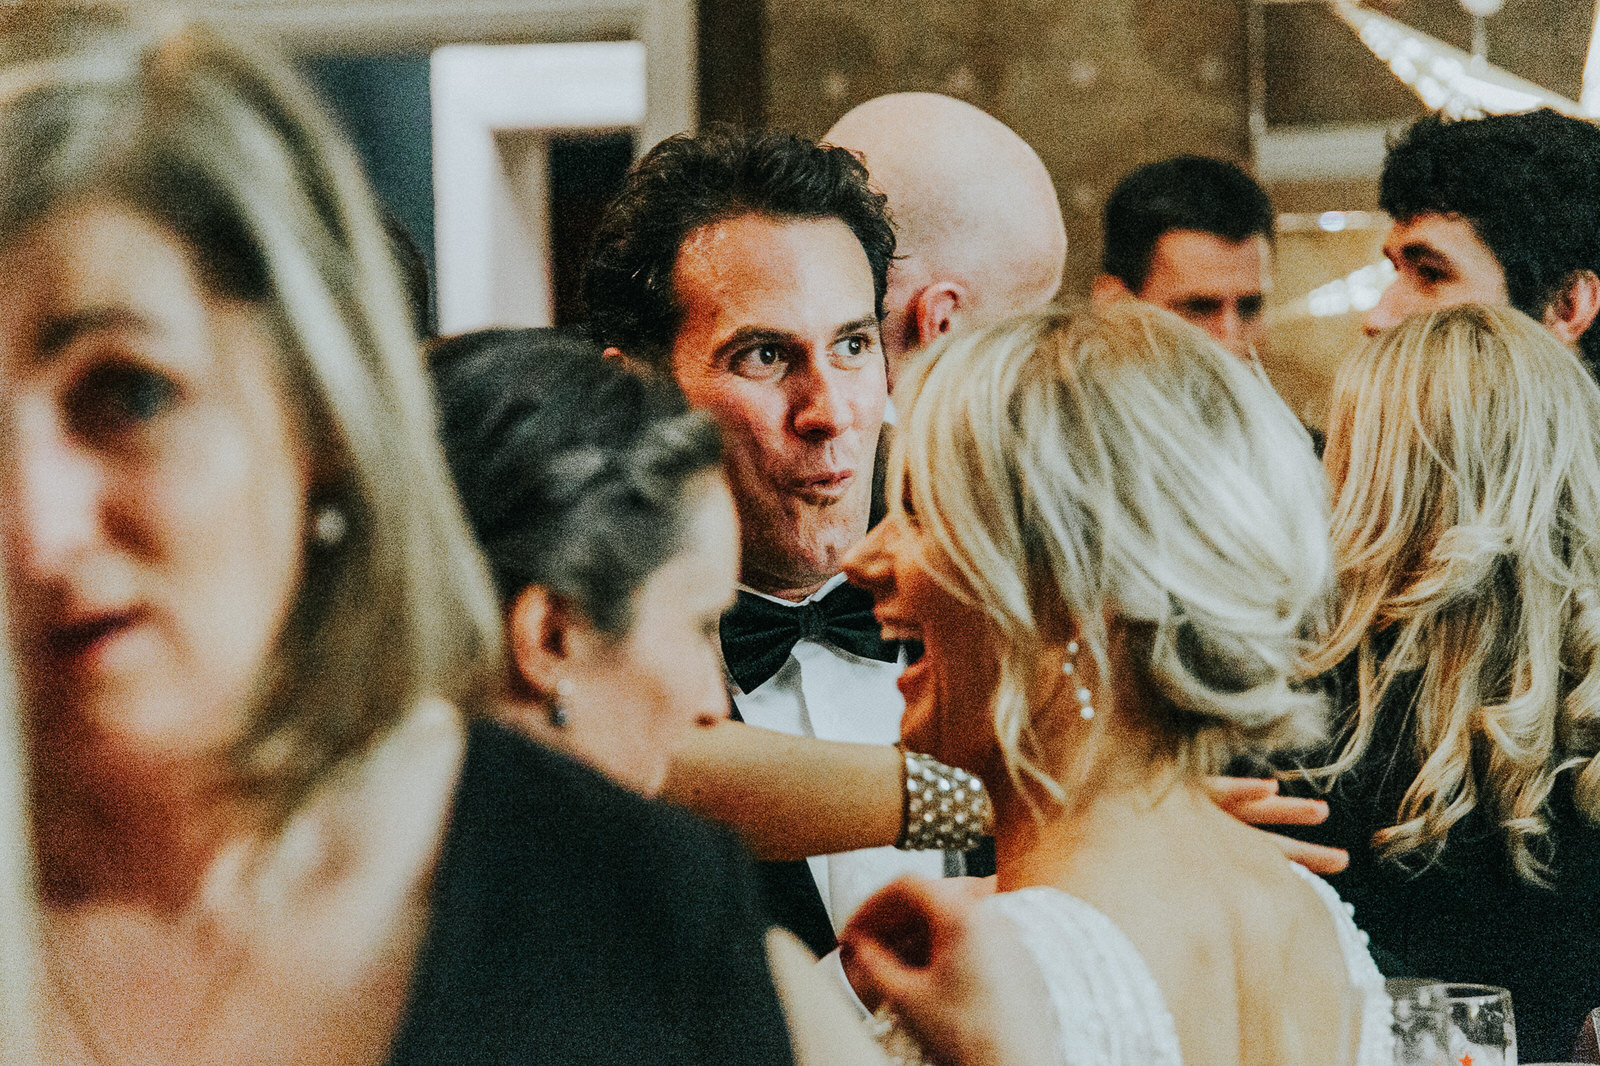 Dunbrody_House_Wedding_photographer_118.jpg